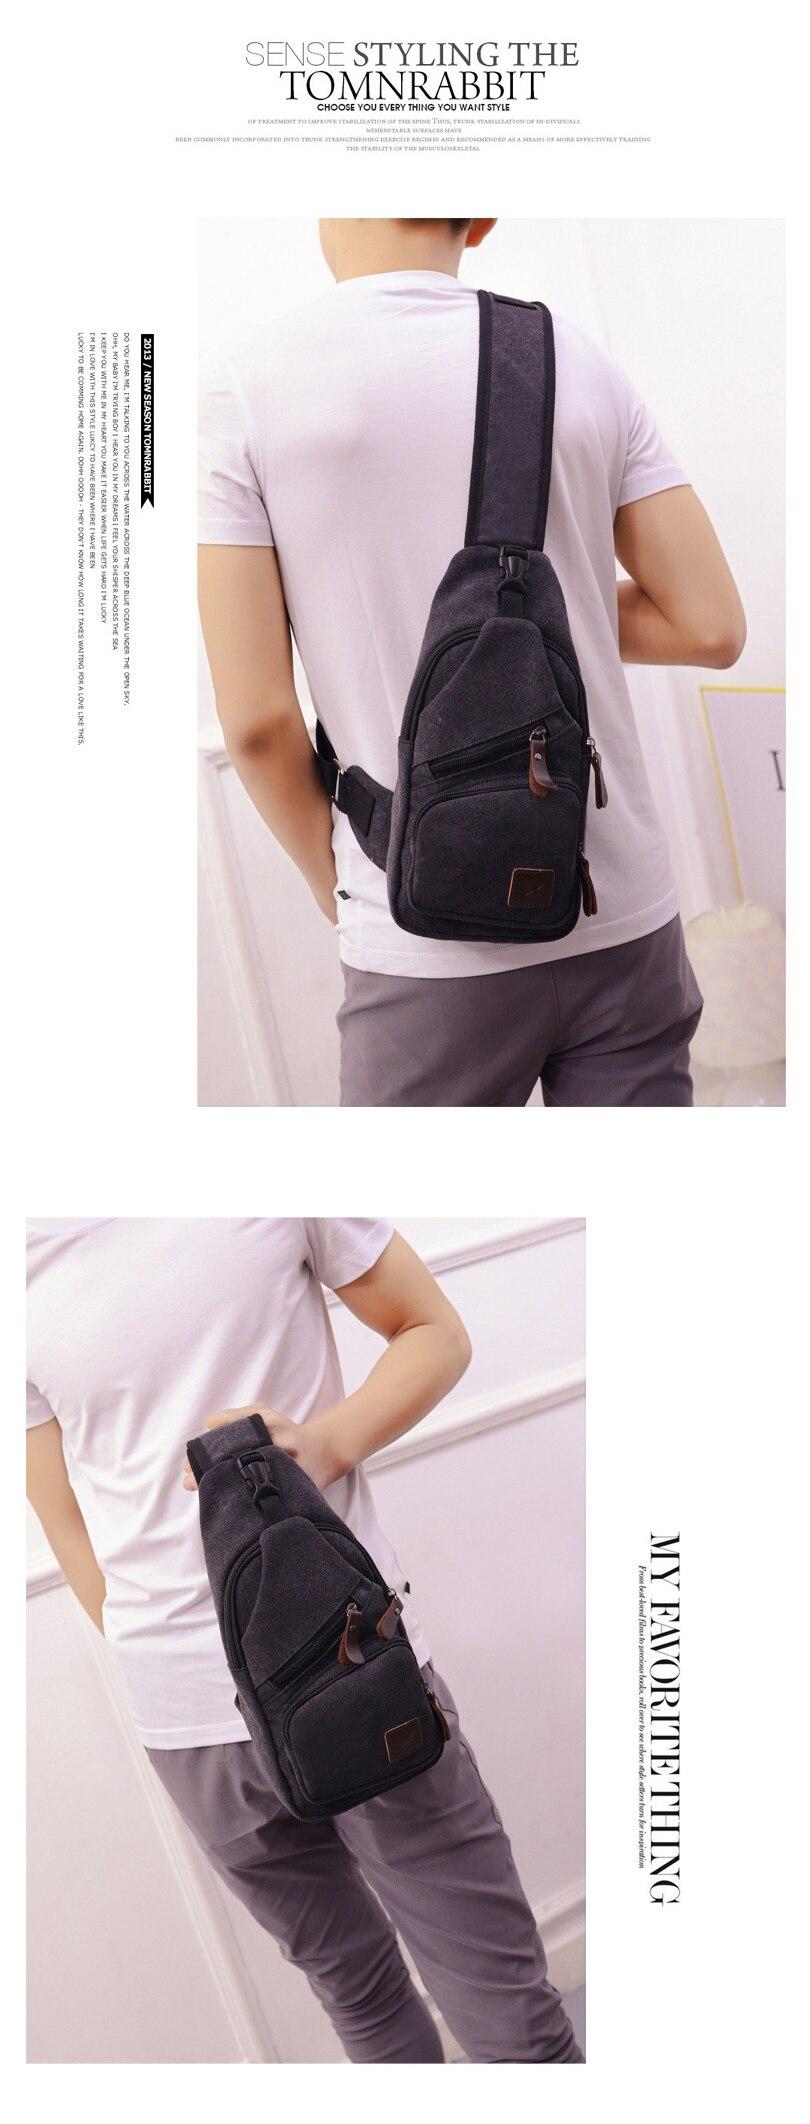 3da44f1836 New Sling Bag Canvas Chest Pack Men Messenger Bags Casual Travel Fanny Flap  Male Small Retro Shoulder Bag 15 6 33 Cm. NB401 01 NB401 02 ...